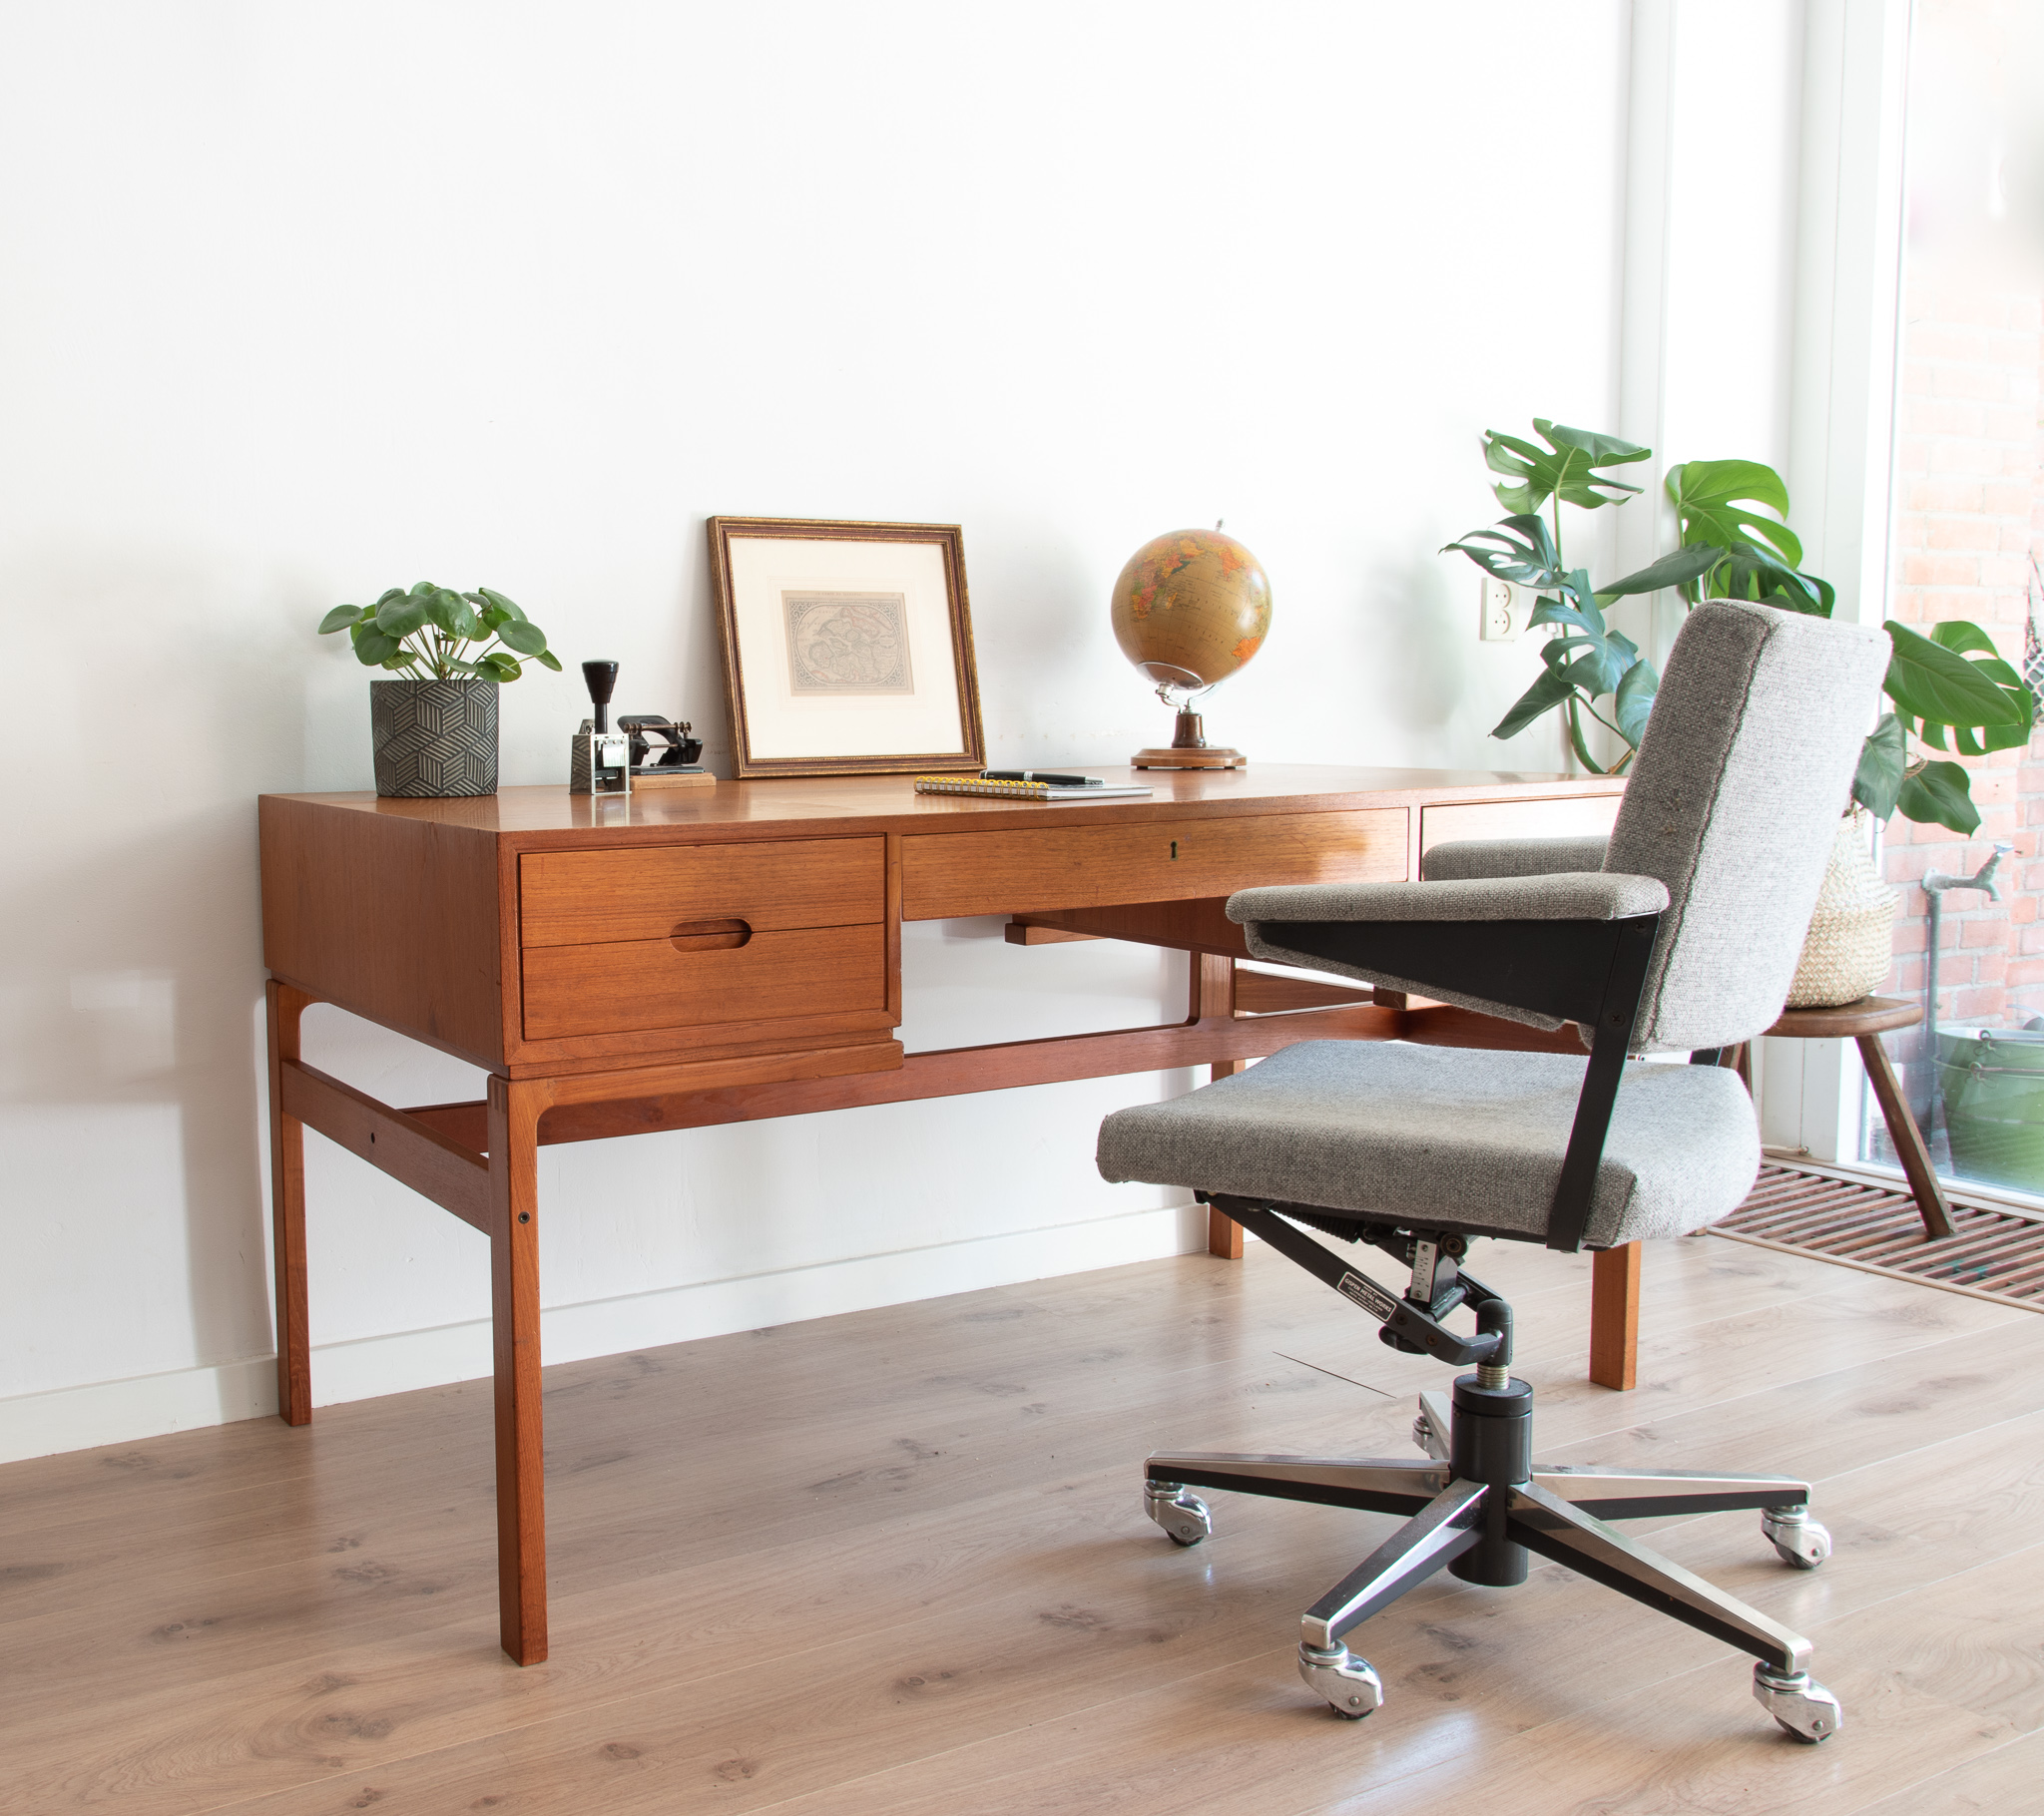 Originele Gispen Bureaustoel.Workspace Design Variavintage